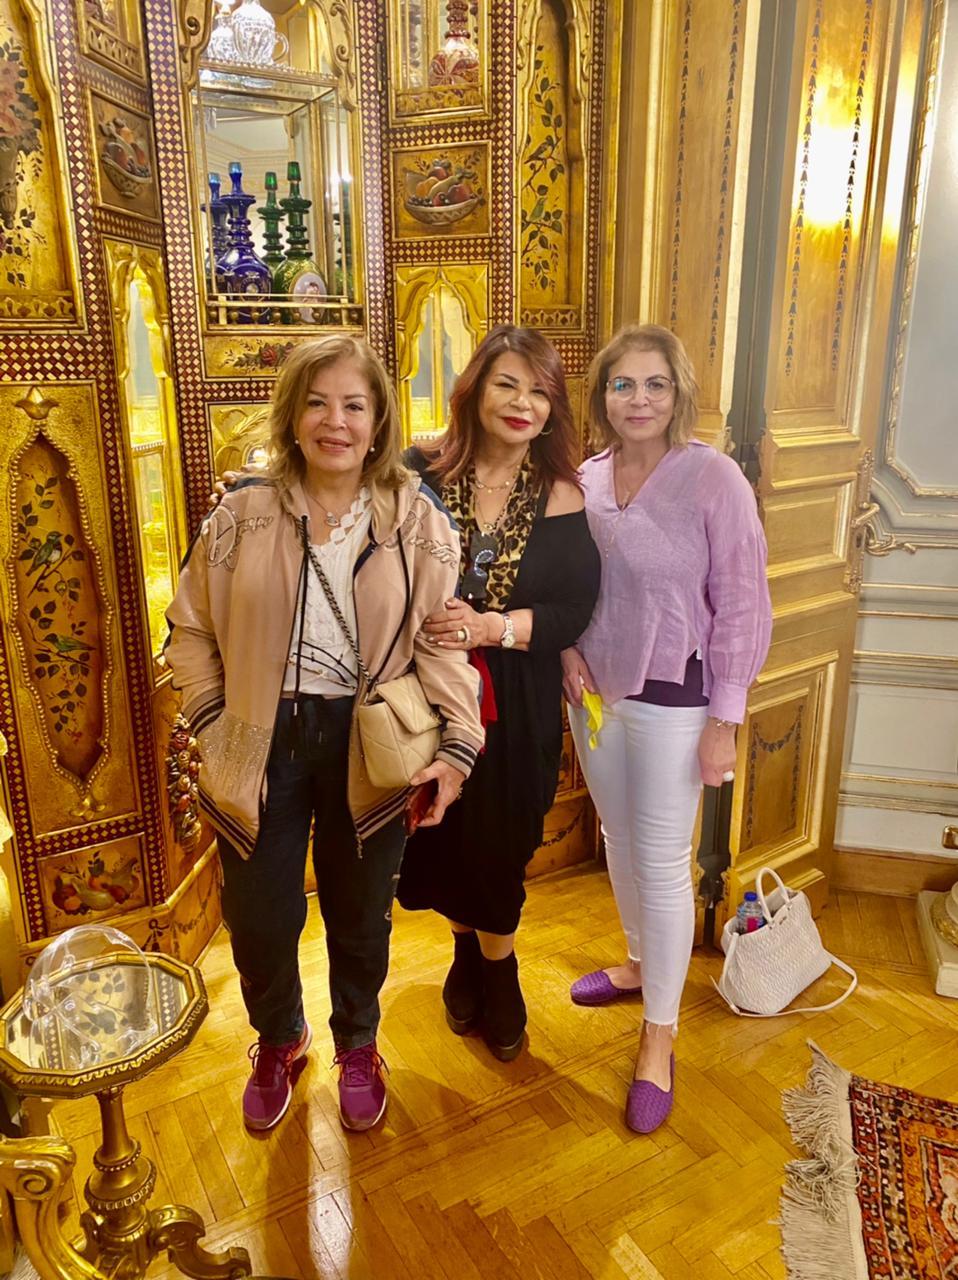 5- IWC of zamalek members inside the luxurious Qubbah Palace